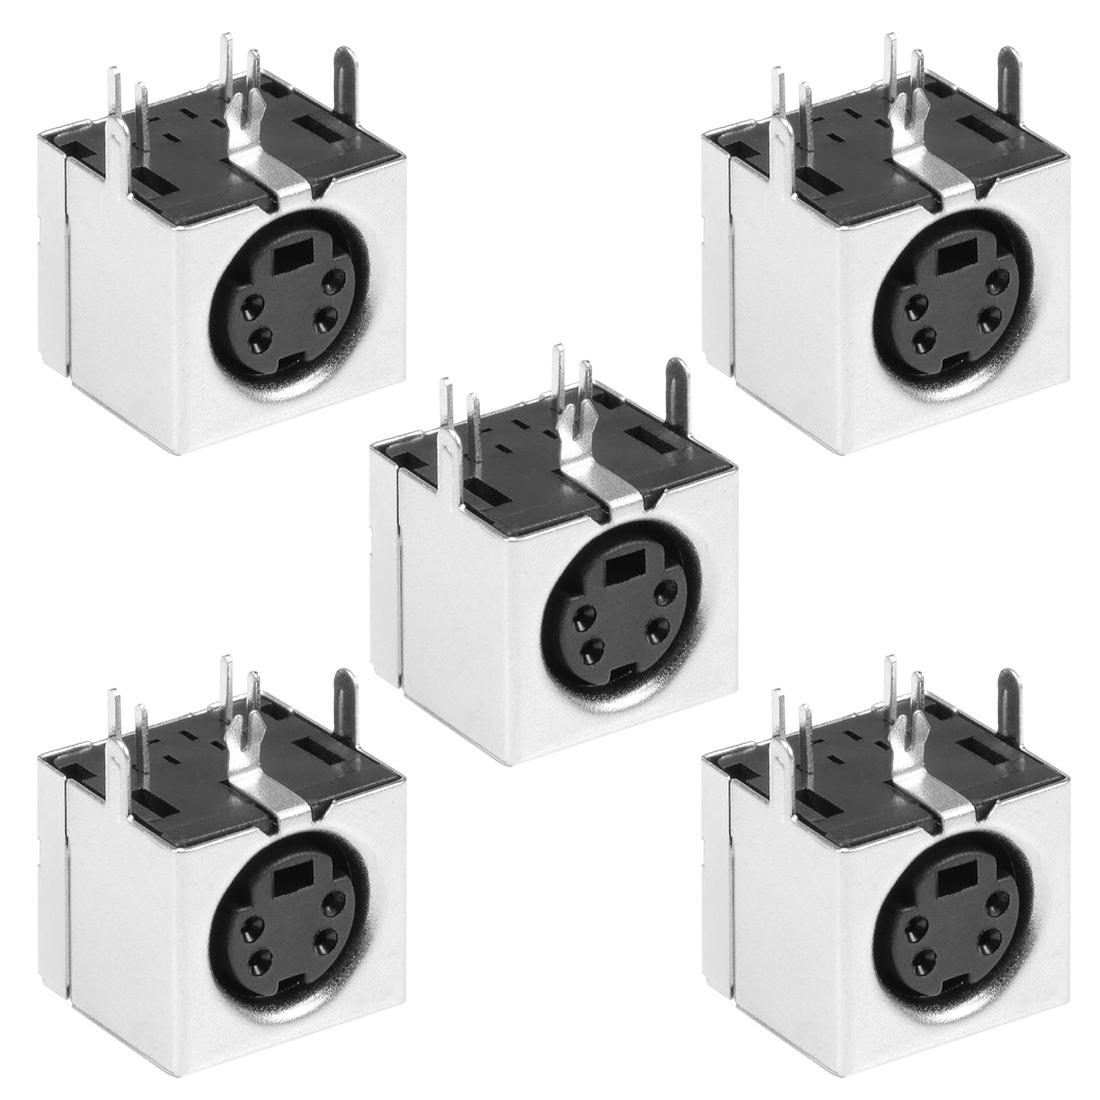 S-video PCB Mount 4 Pin Mini Din Socket Audio Video Connector Black 5Pcs